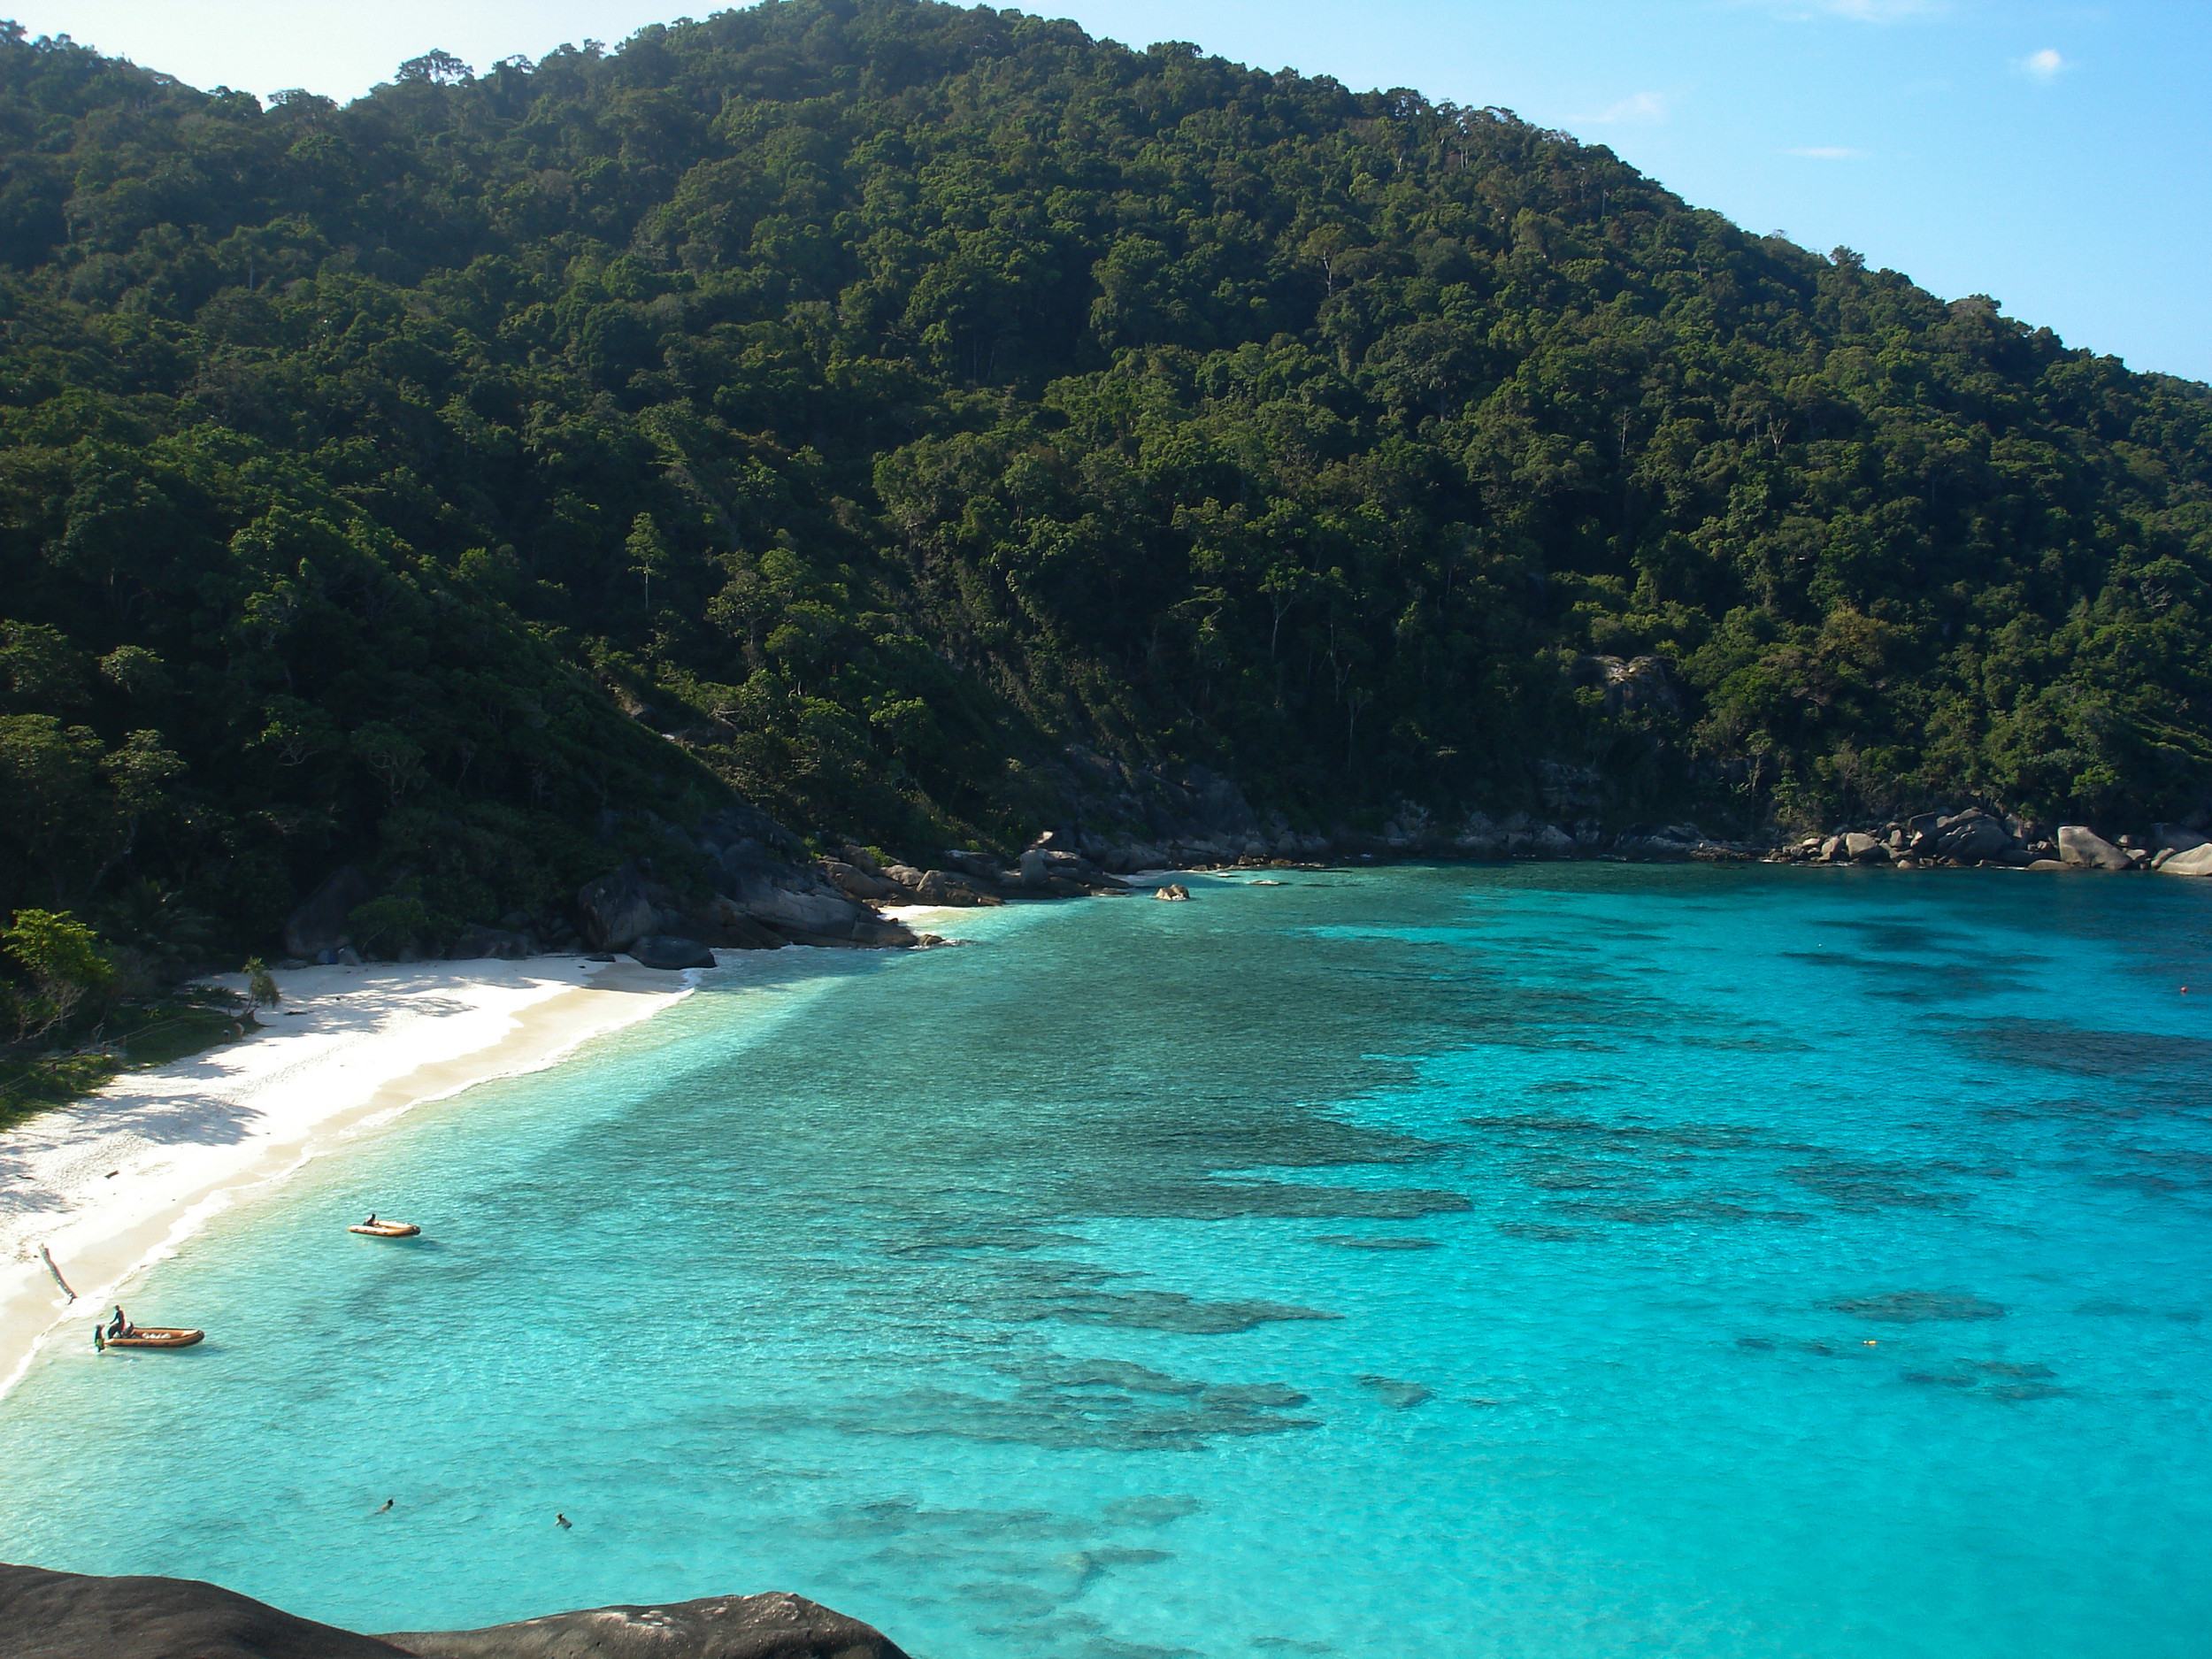 Donald duck Bay, Similan Islands, Thailand